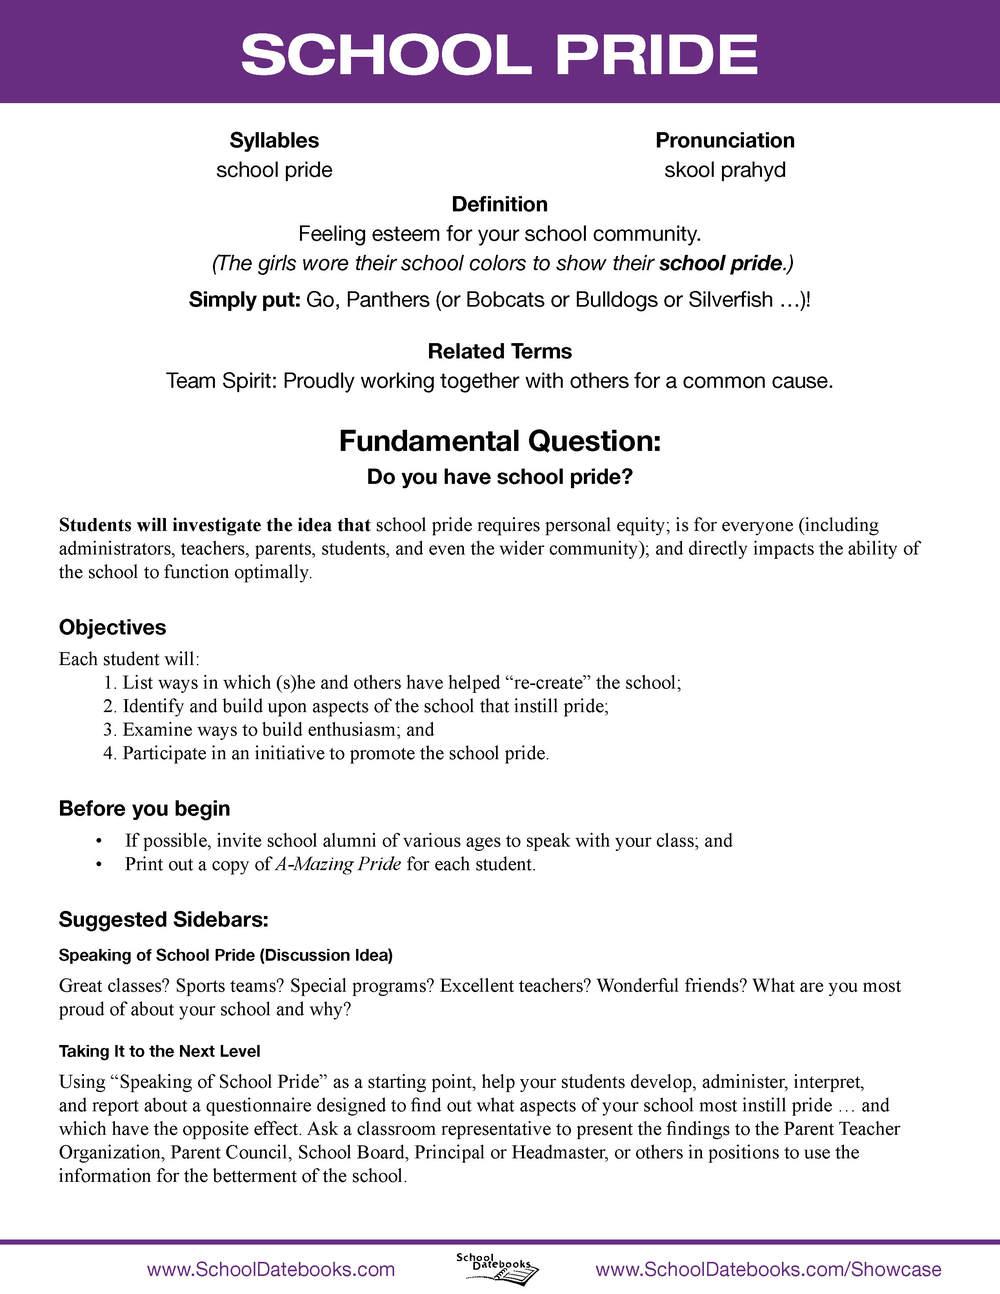 LessonPlan-SchoolPride_Page_1.jpg